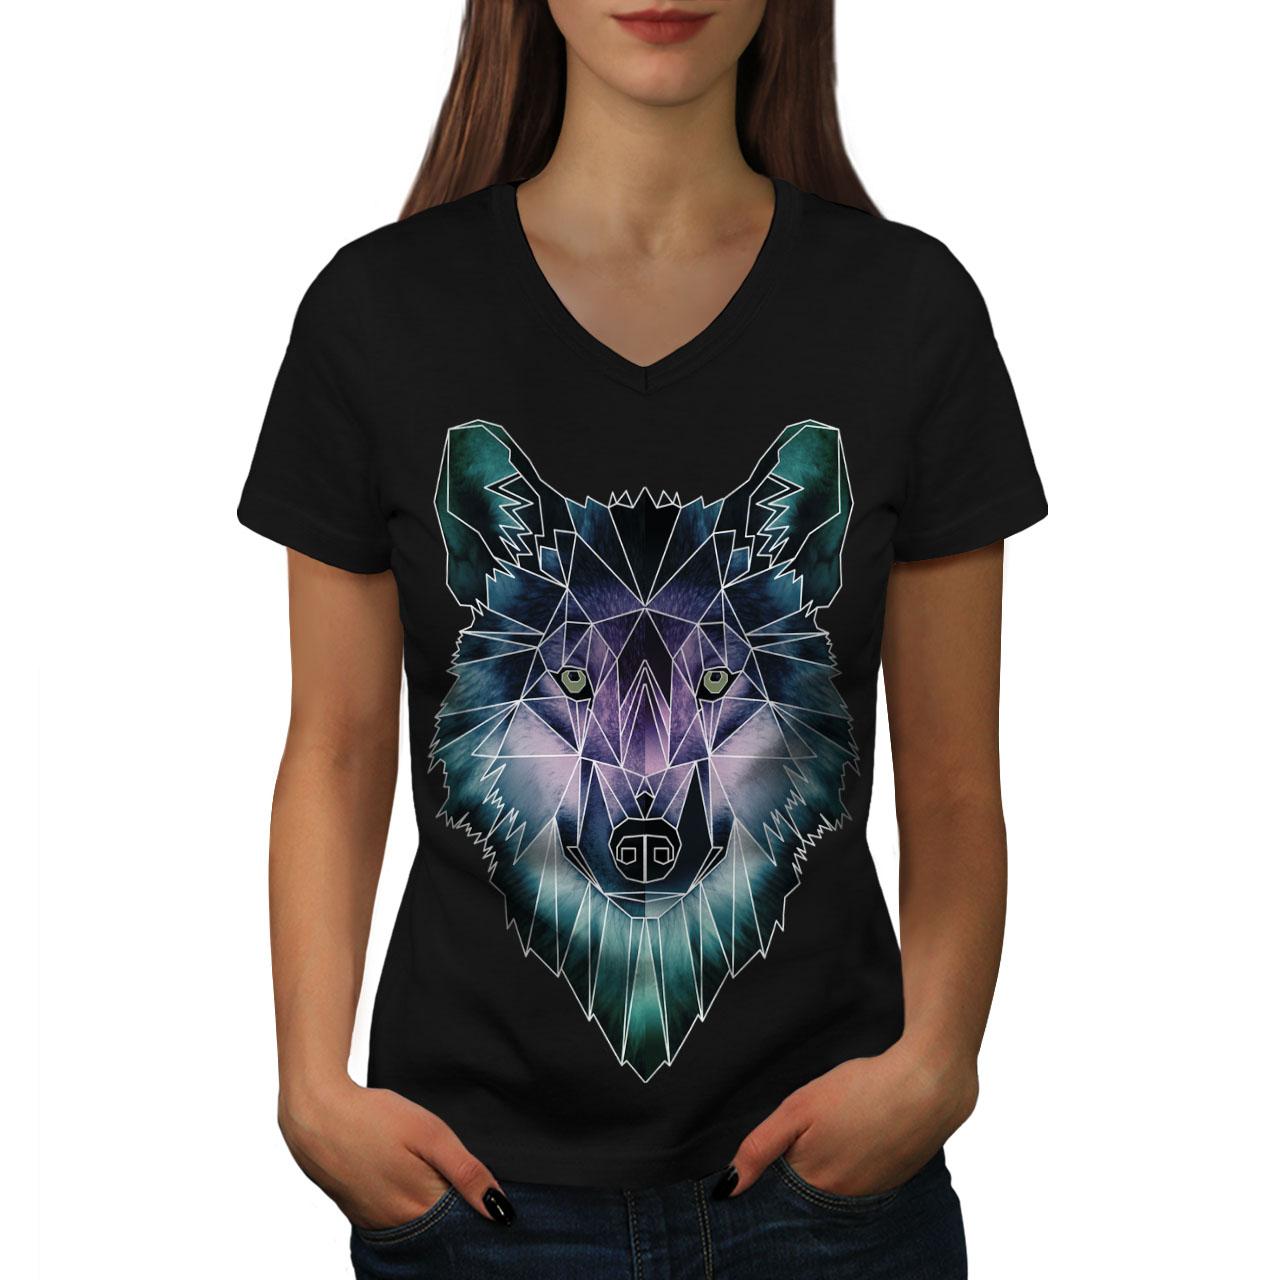 Wellcoda-Psychodelic-Wolf-Womens-V-Neck-T-shirt-Crystal-Graphic-Design-Tee thumbnail 3